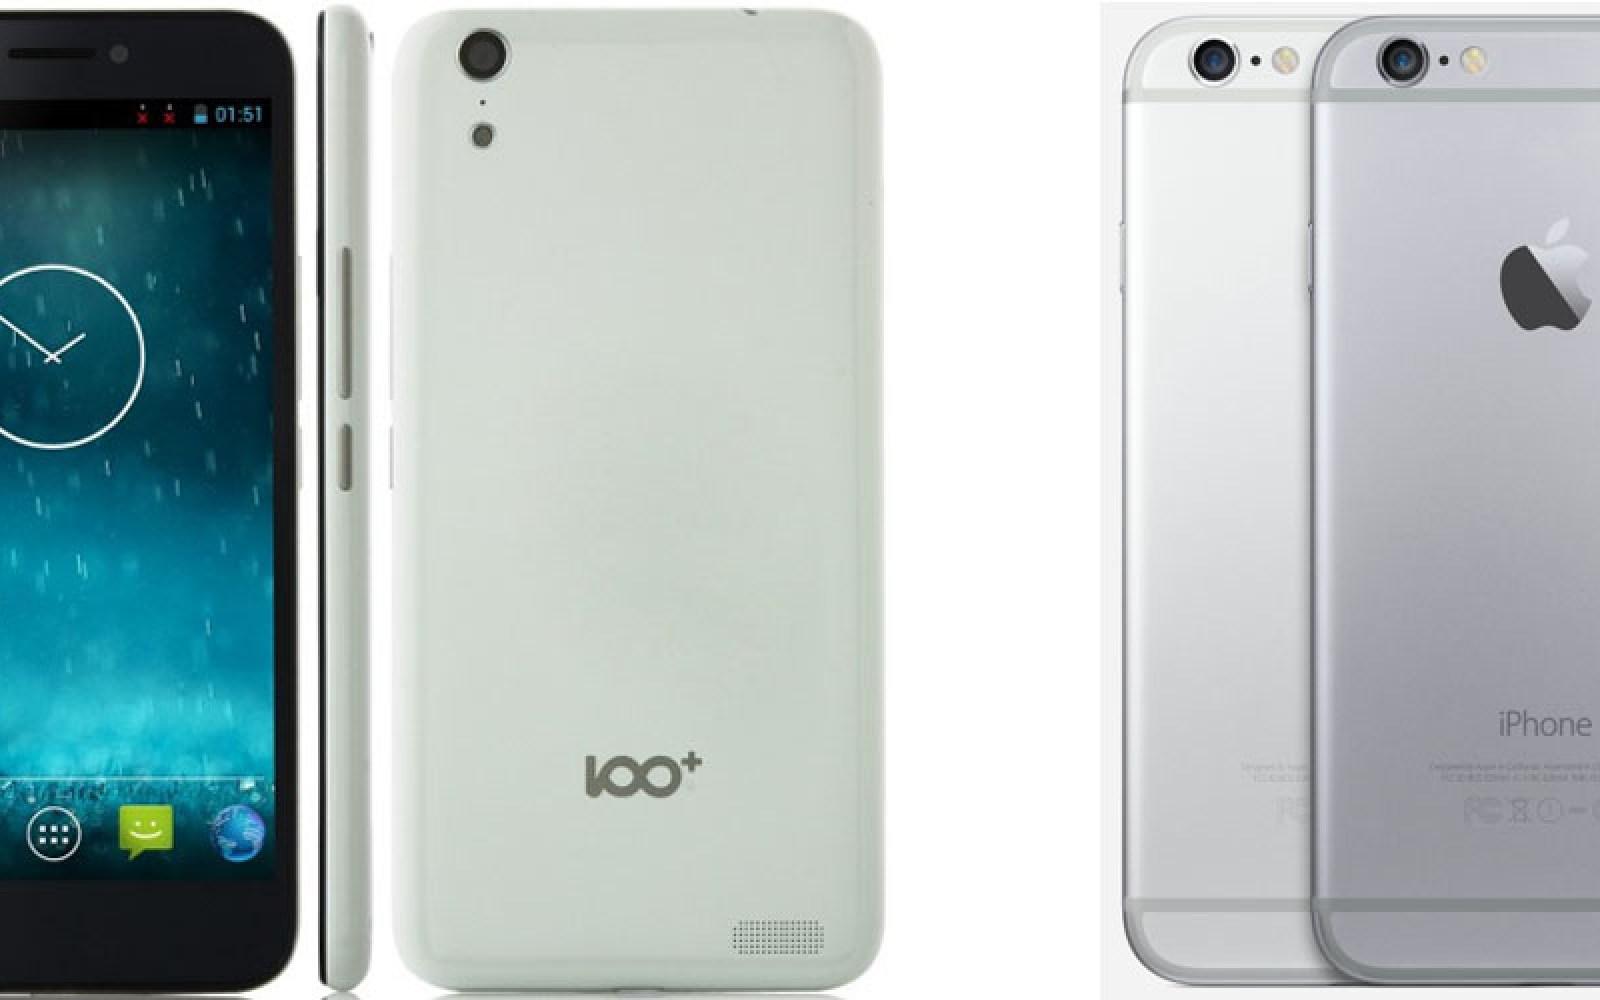 Bizarre Beijing ruling says iPhone 6 copies Chinese phone, Apple must halt sales